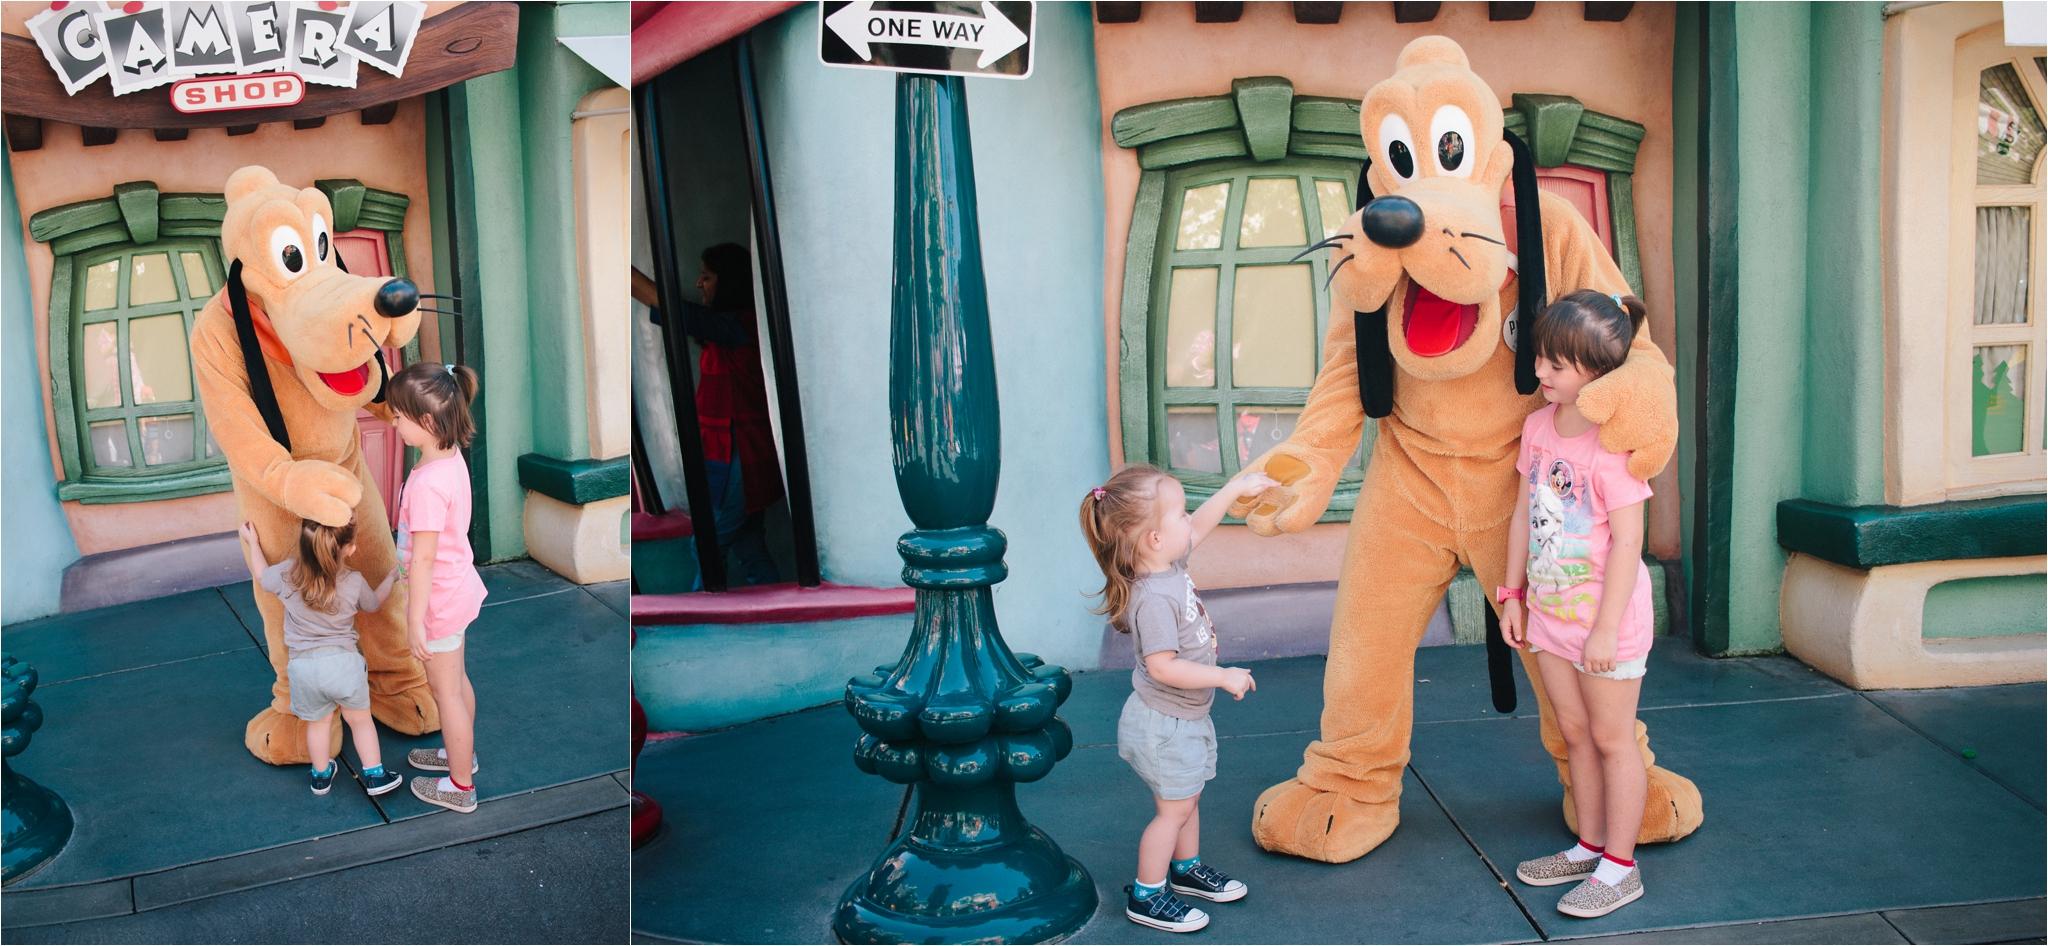 Disneylandroundtwopersonalimages_0019.jpg